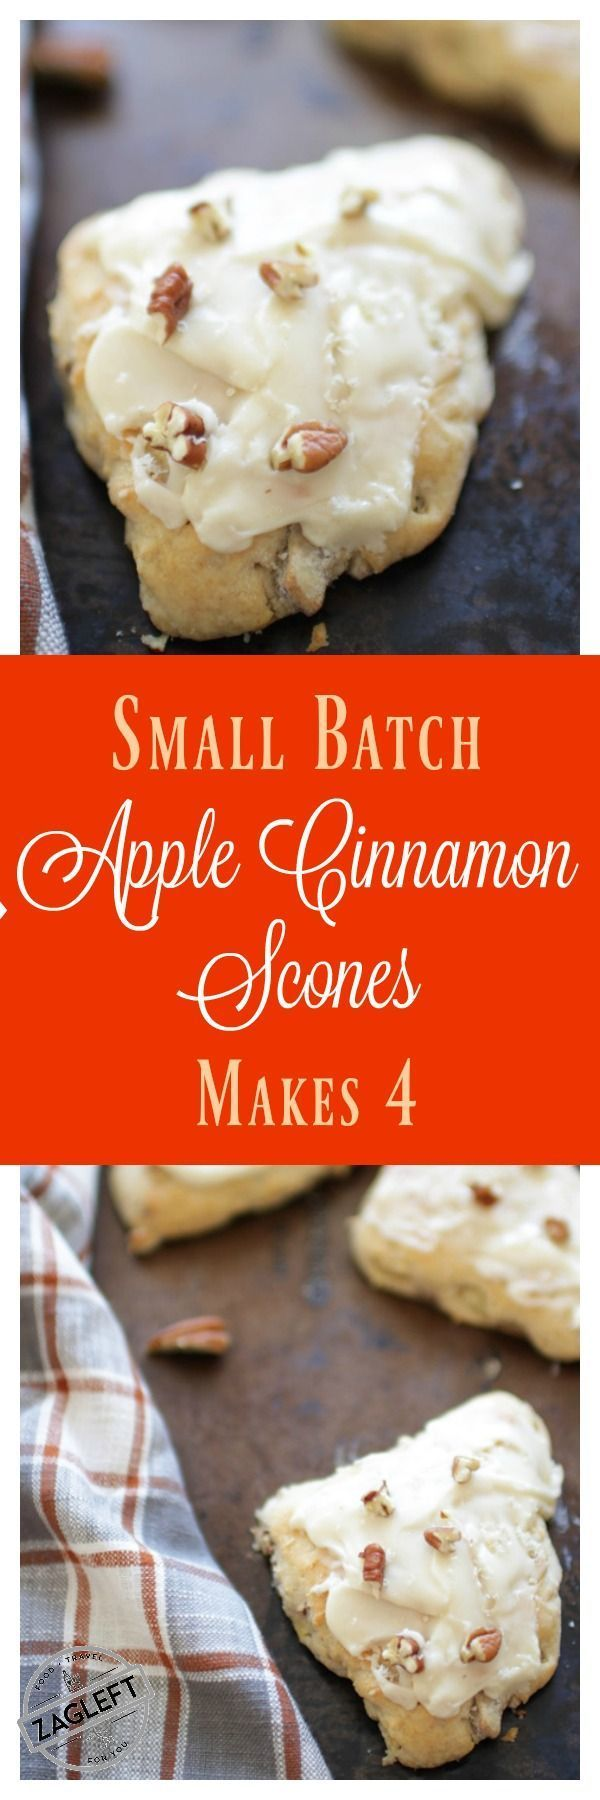 ... Scones on Pinterest | Cream scones, Chocolate scones and Cherry scones